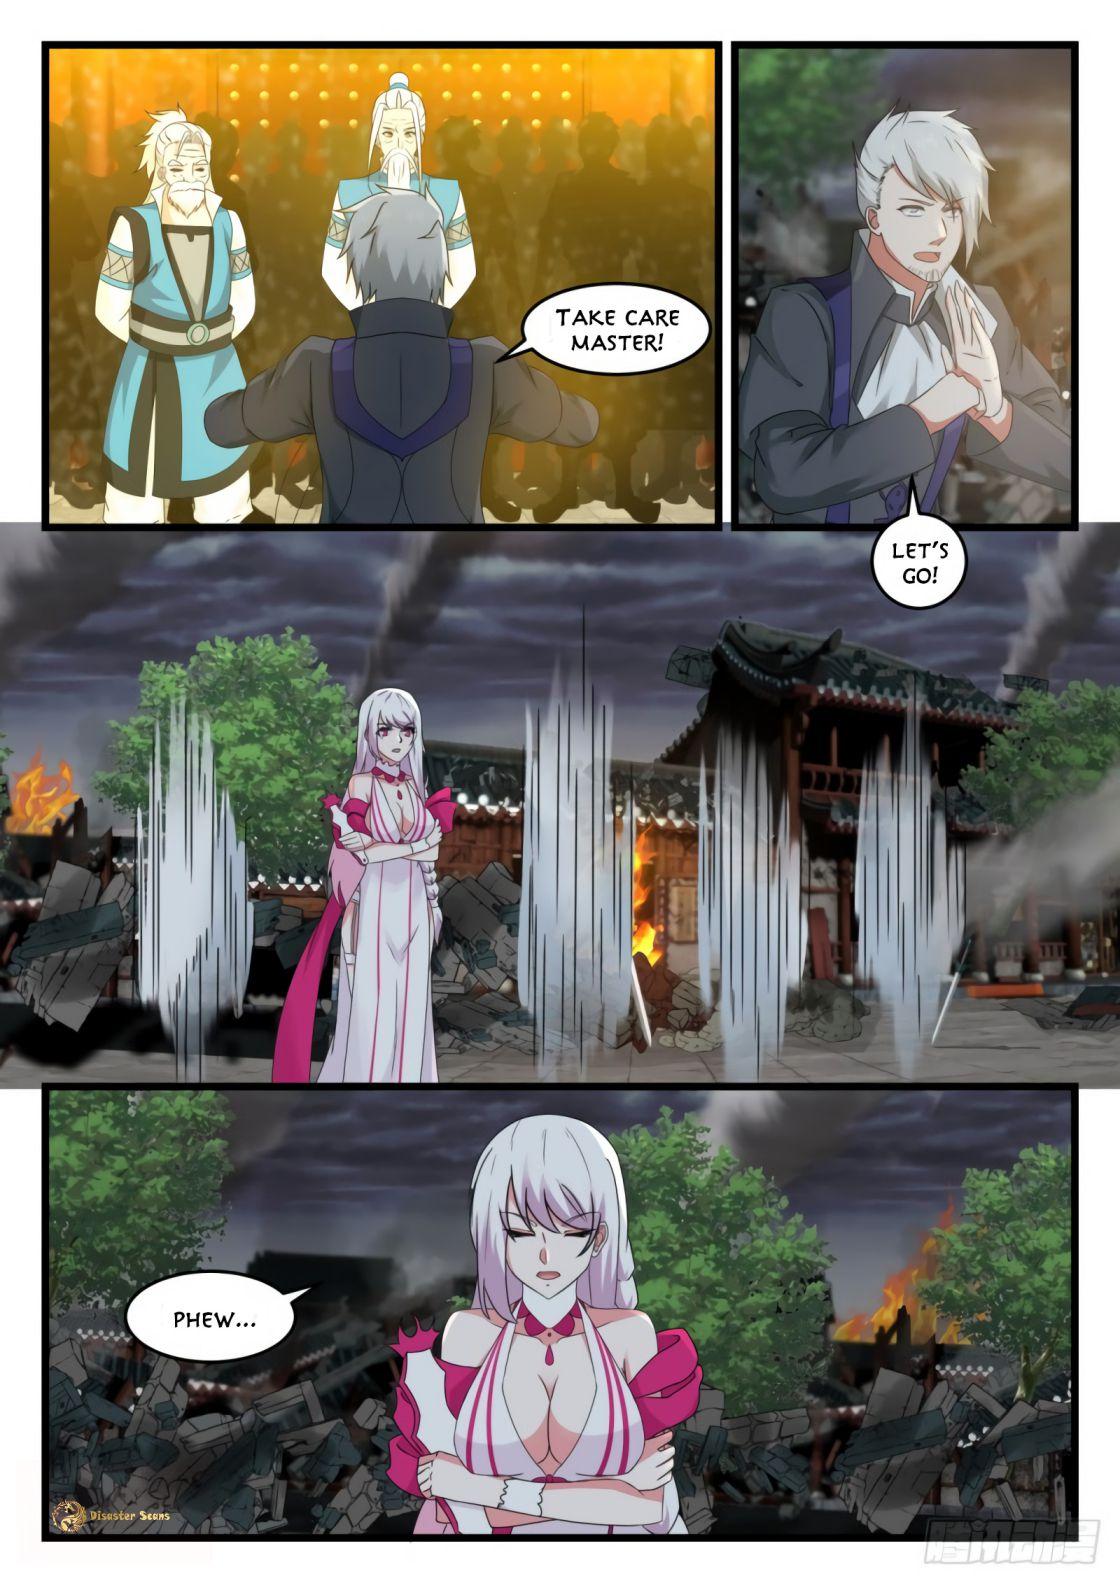 Martial Peak - chapter 532-eng-li